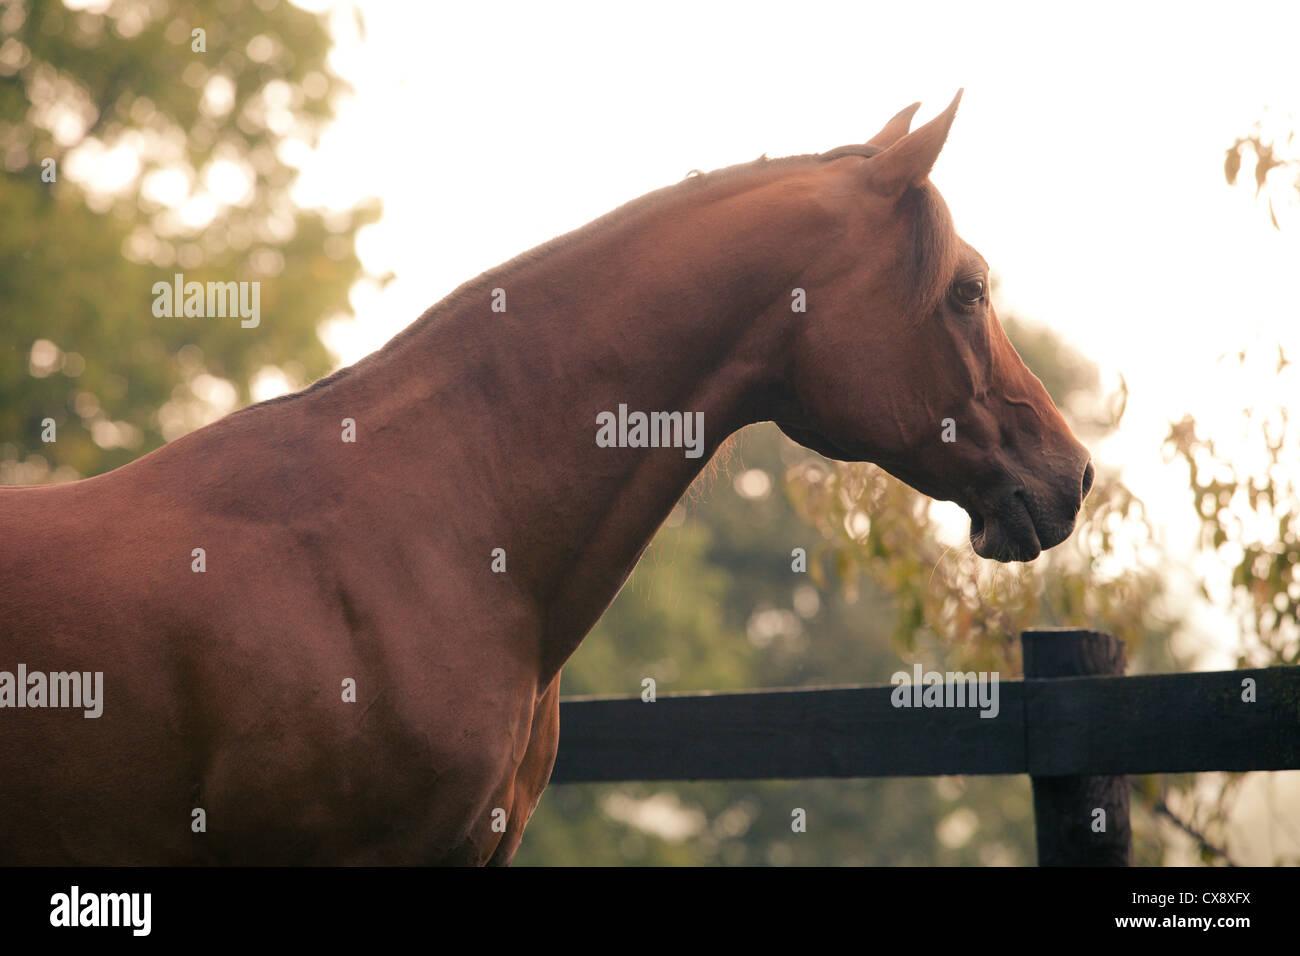 Polish Arabian bay male horse looking away - Stock Image